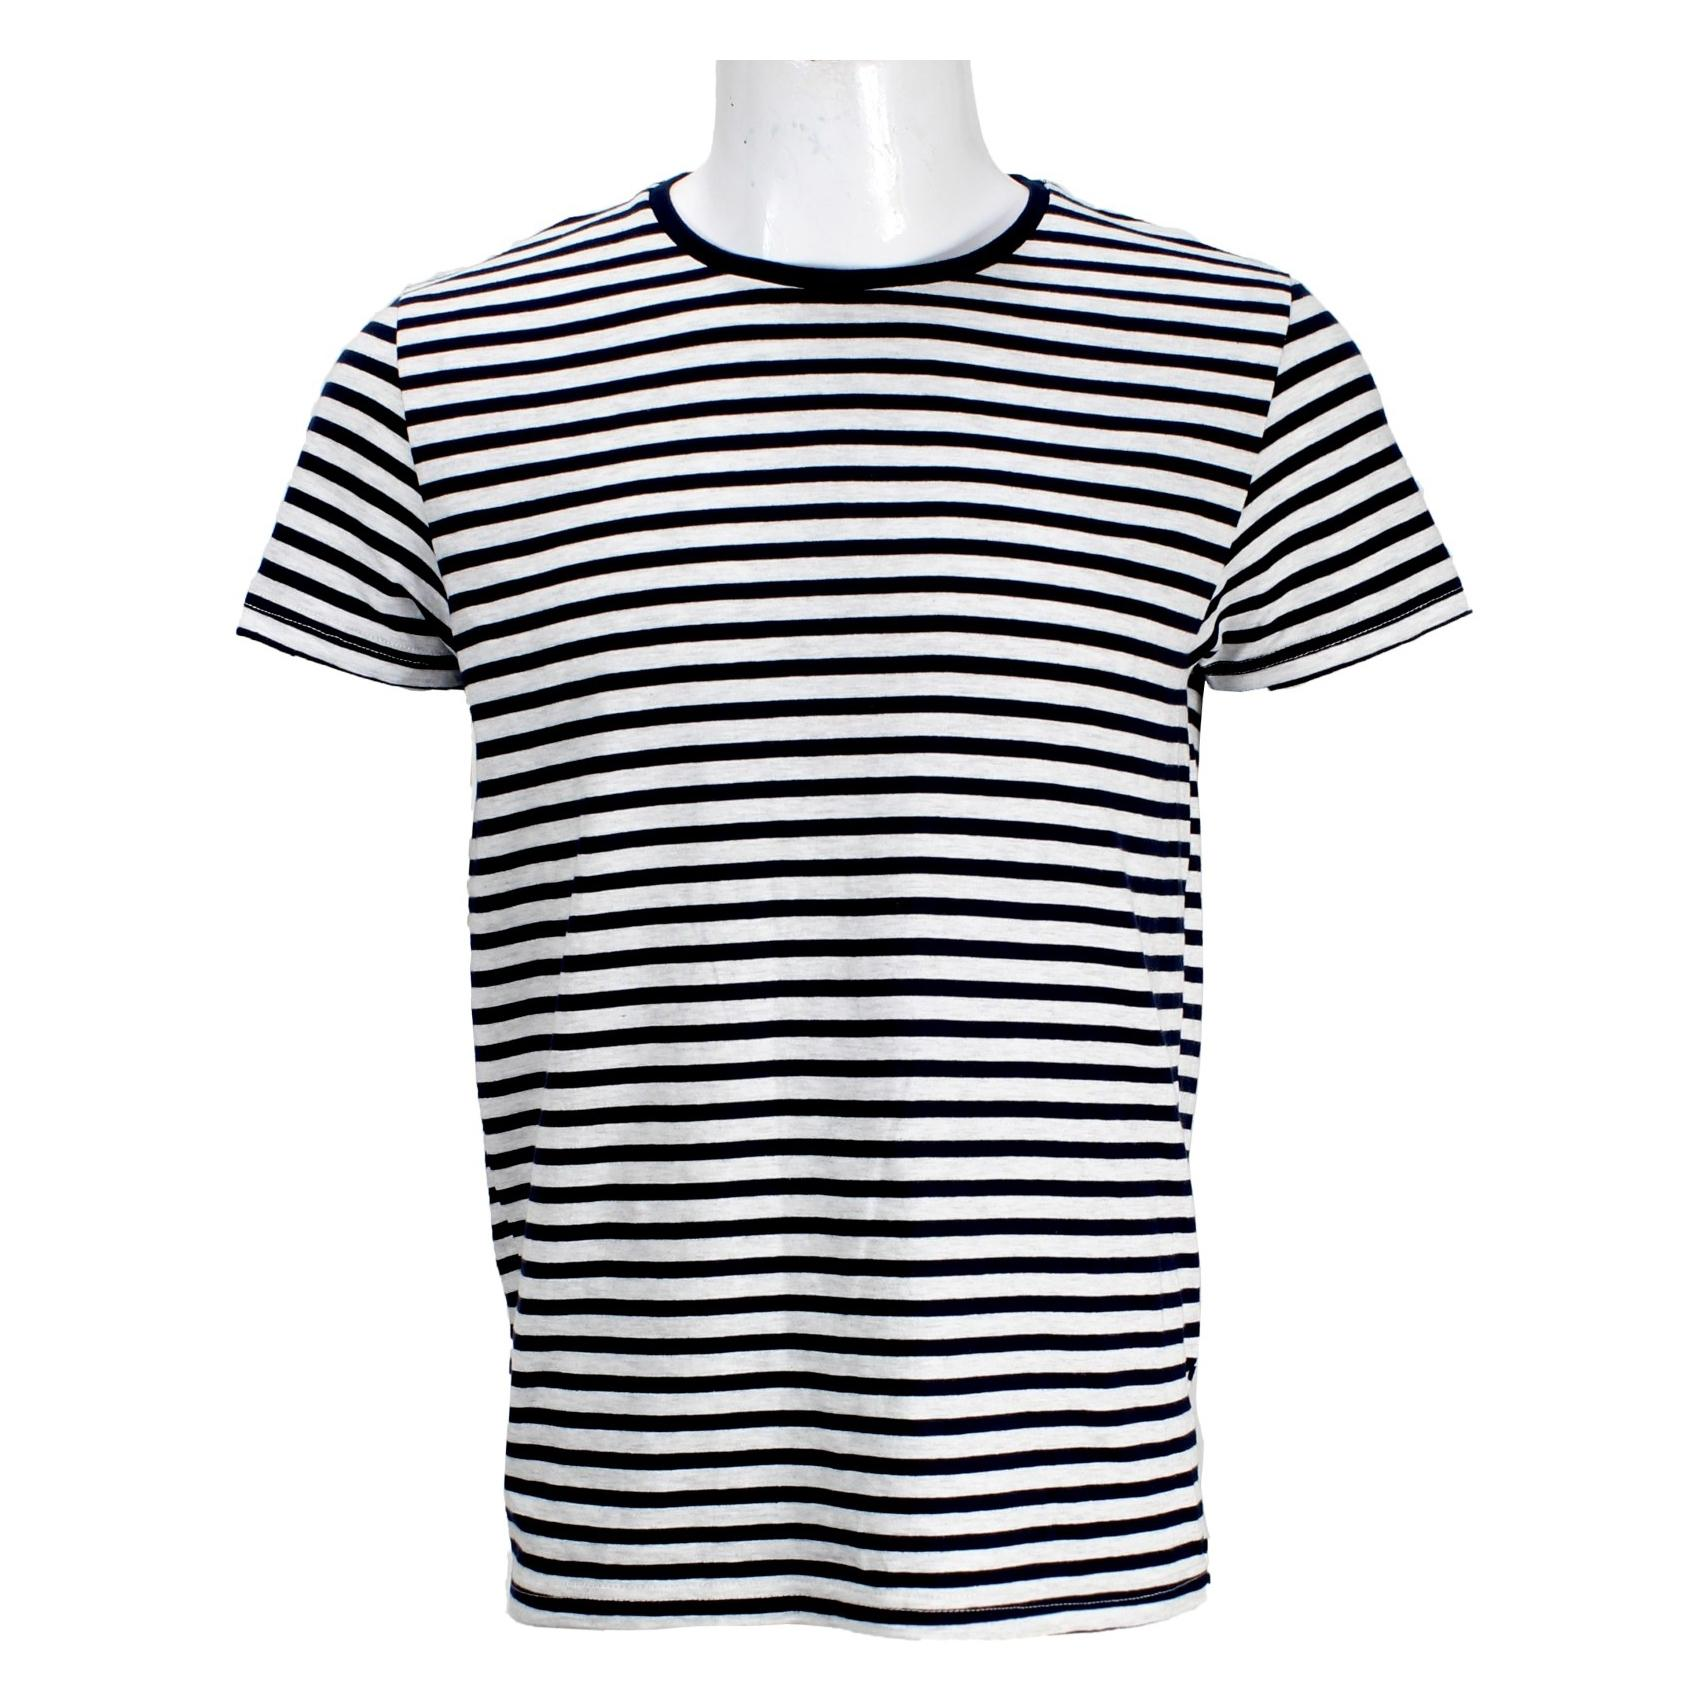 e45431aad5b441 Blue/White Striped Round Neck T-Shirt For Men